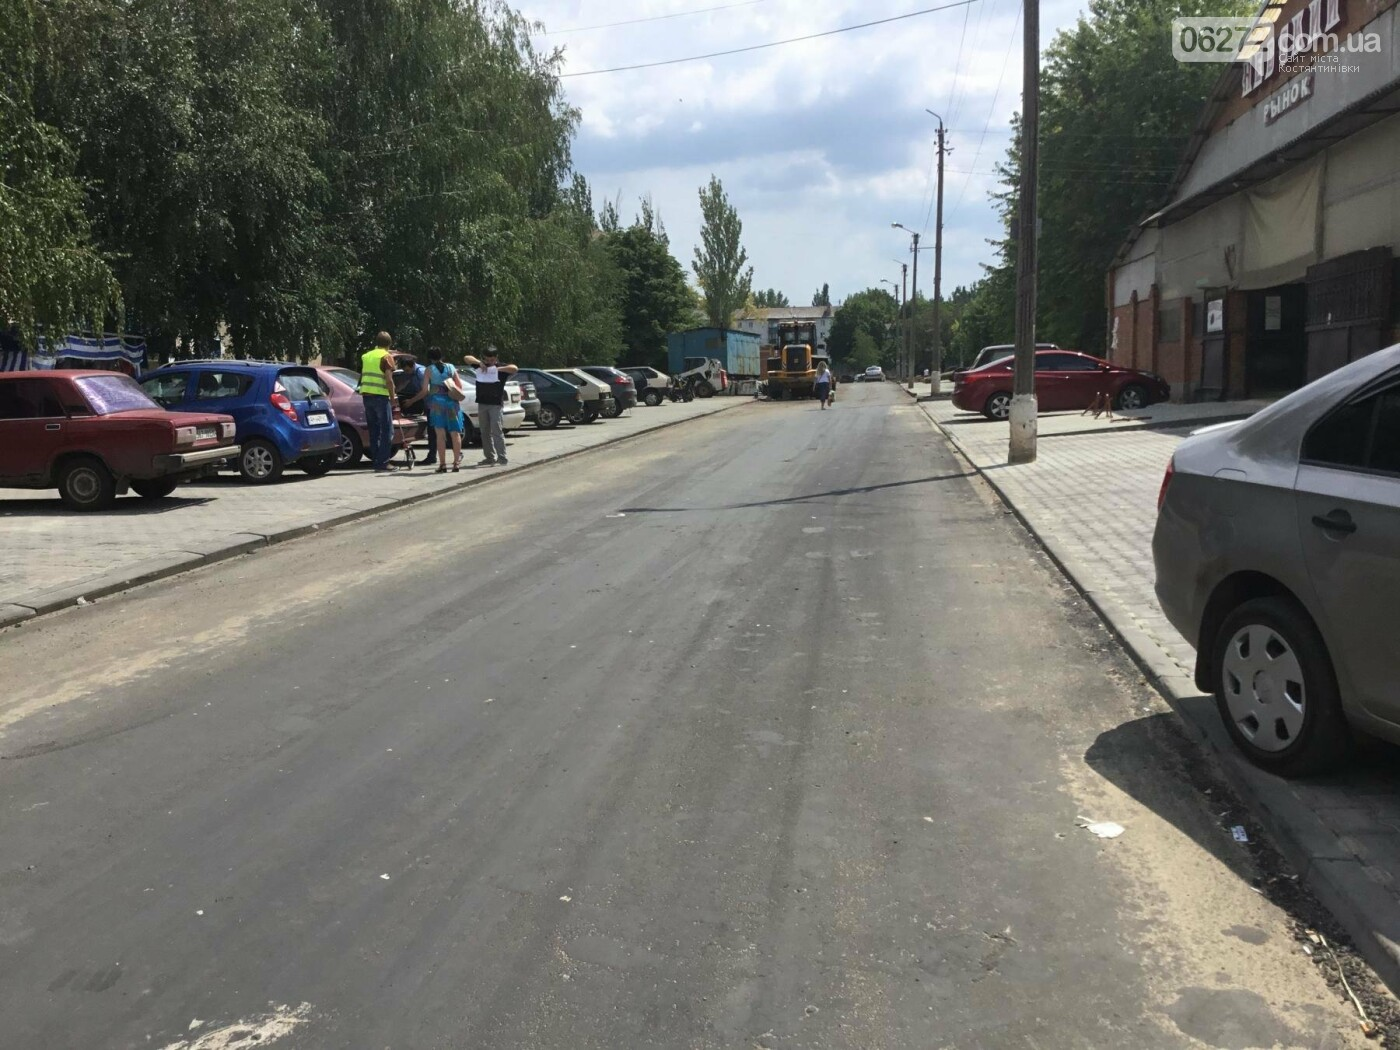 В Константиновке продолжают ремонт дорог, фото-2